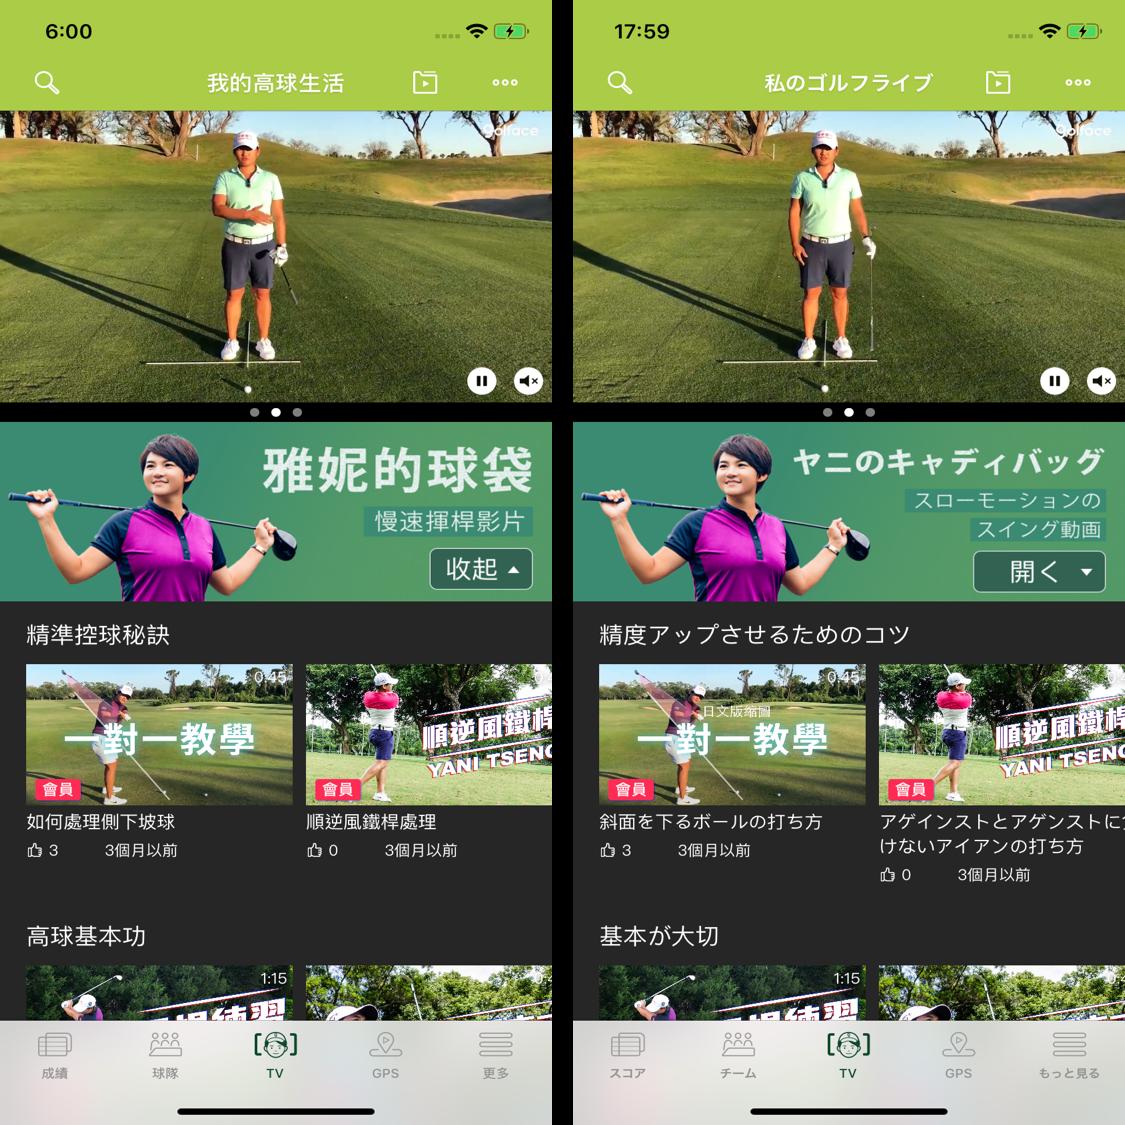 Golface進軍日本,所開發的APP也新增了日文版本。